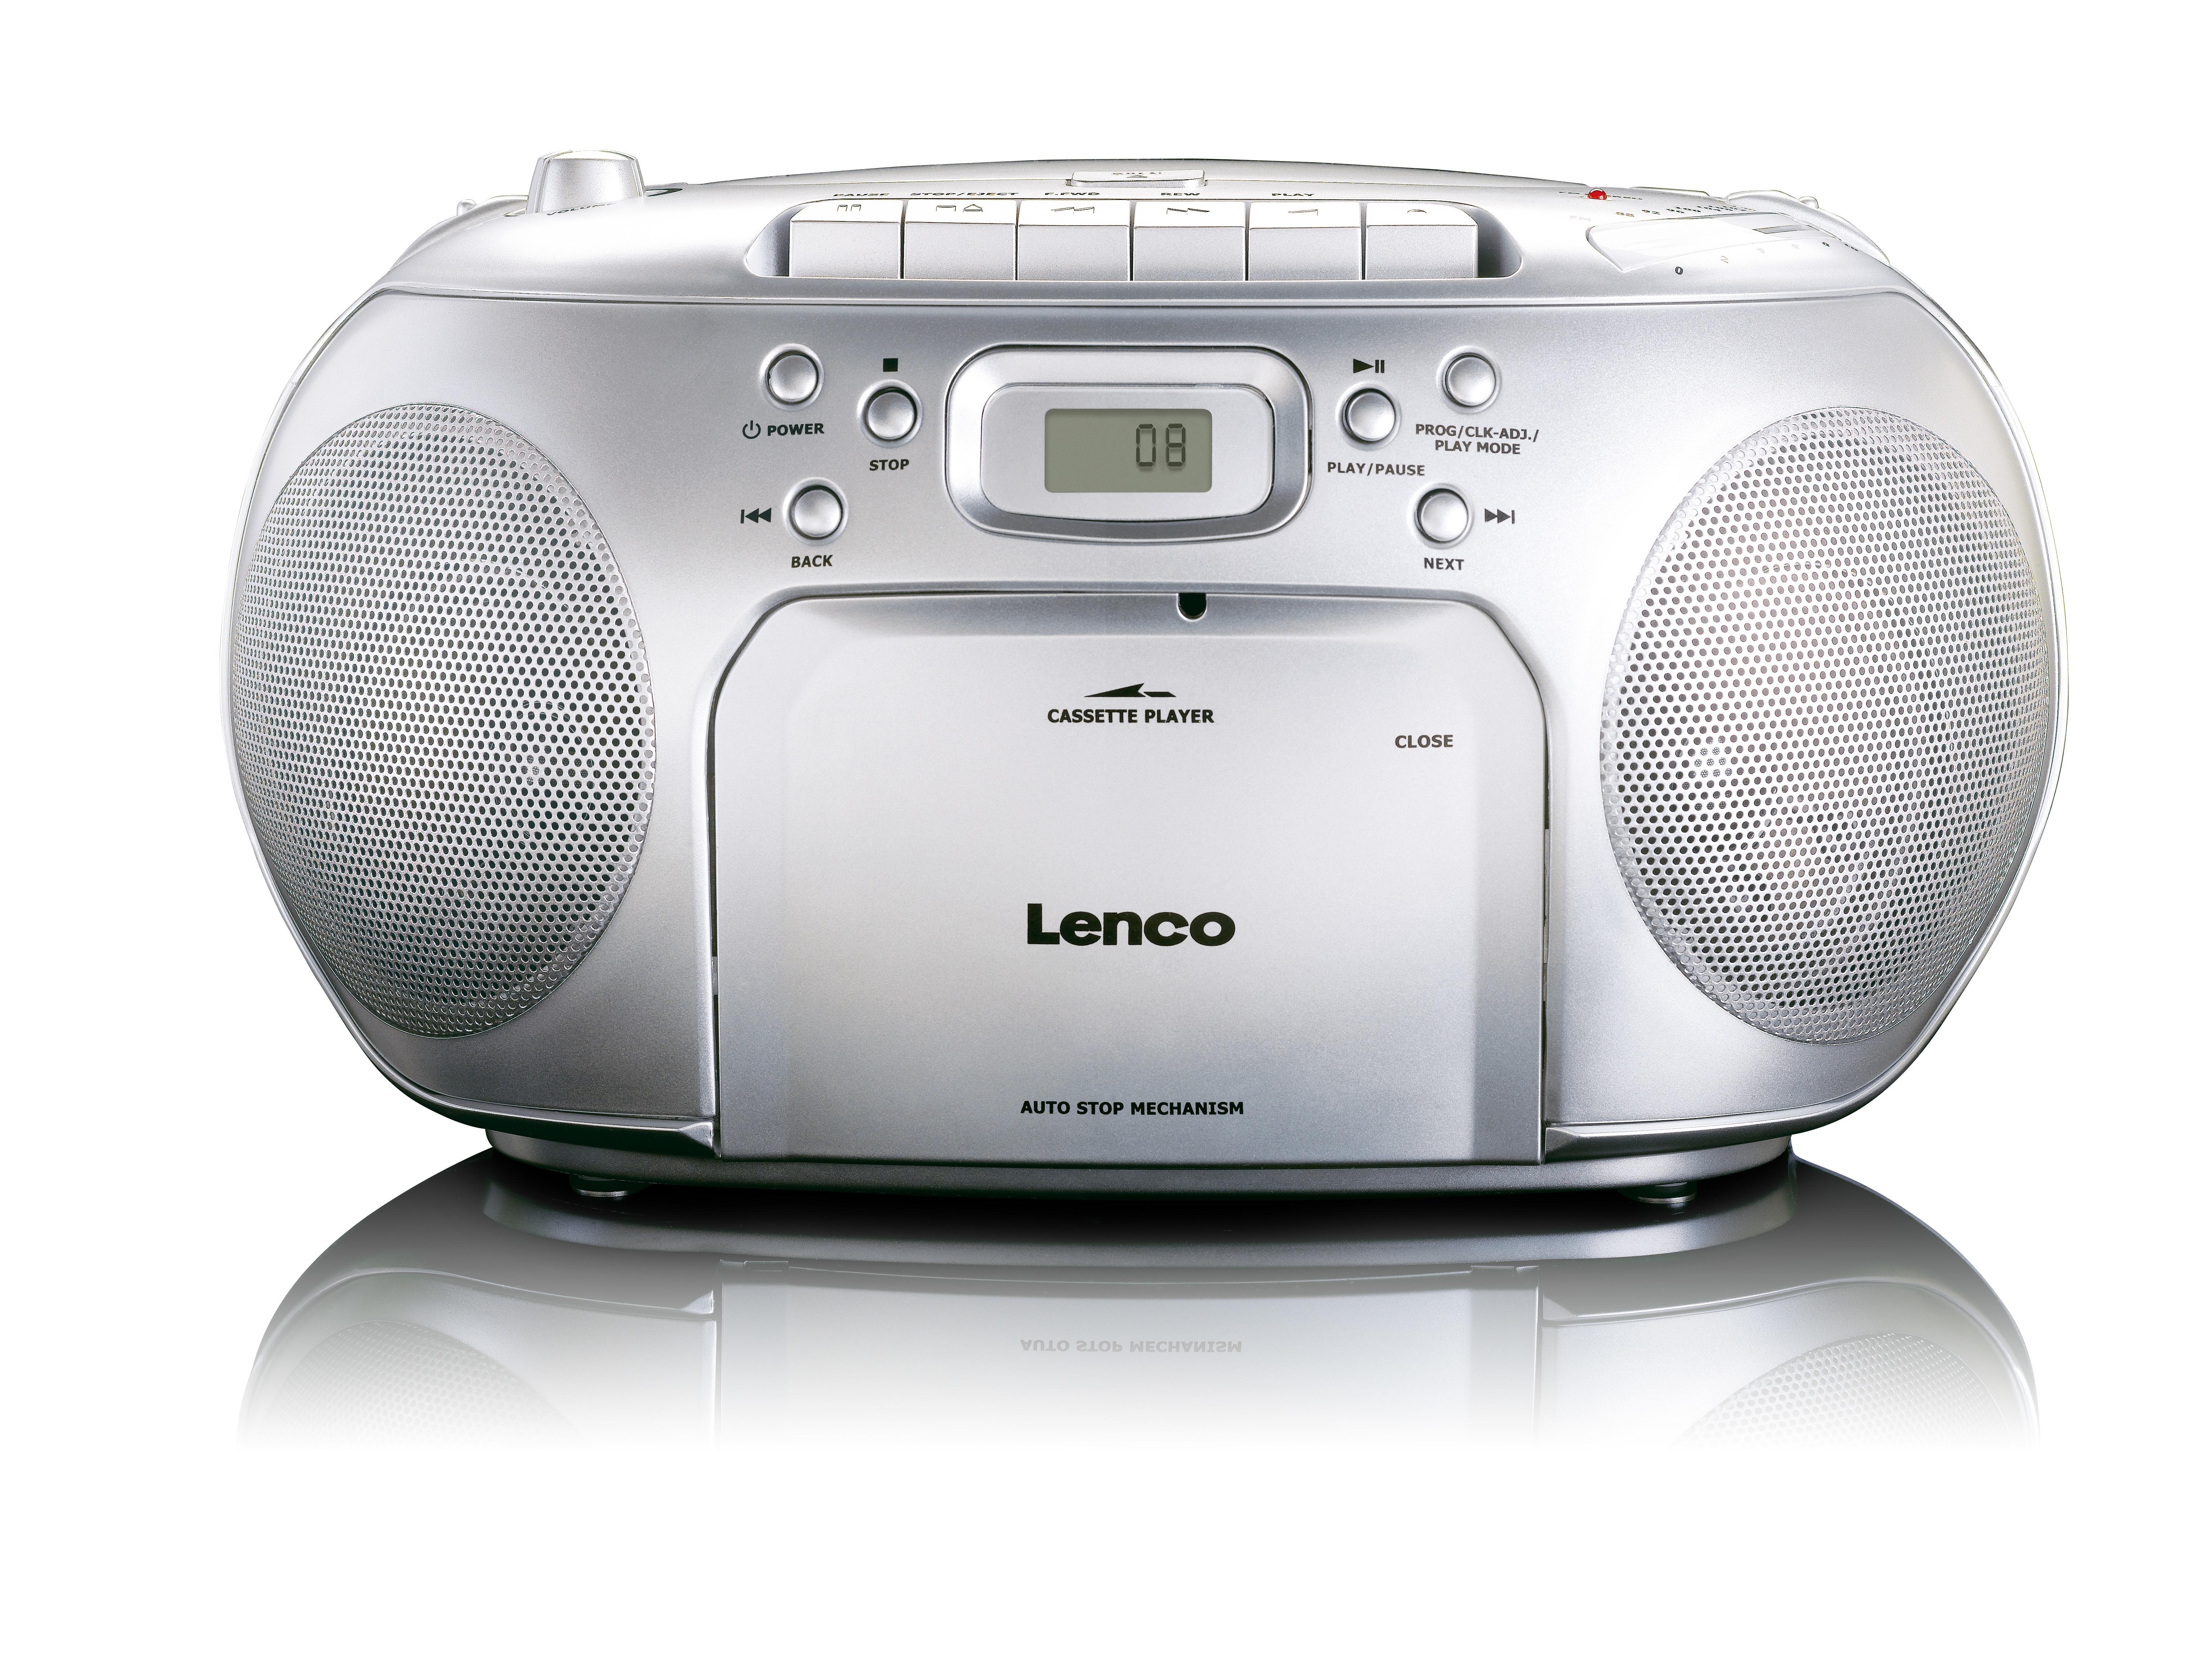 LENCO LENCO Portable radio-cd-speler